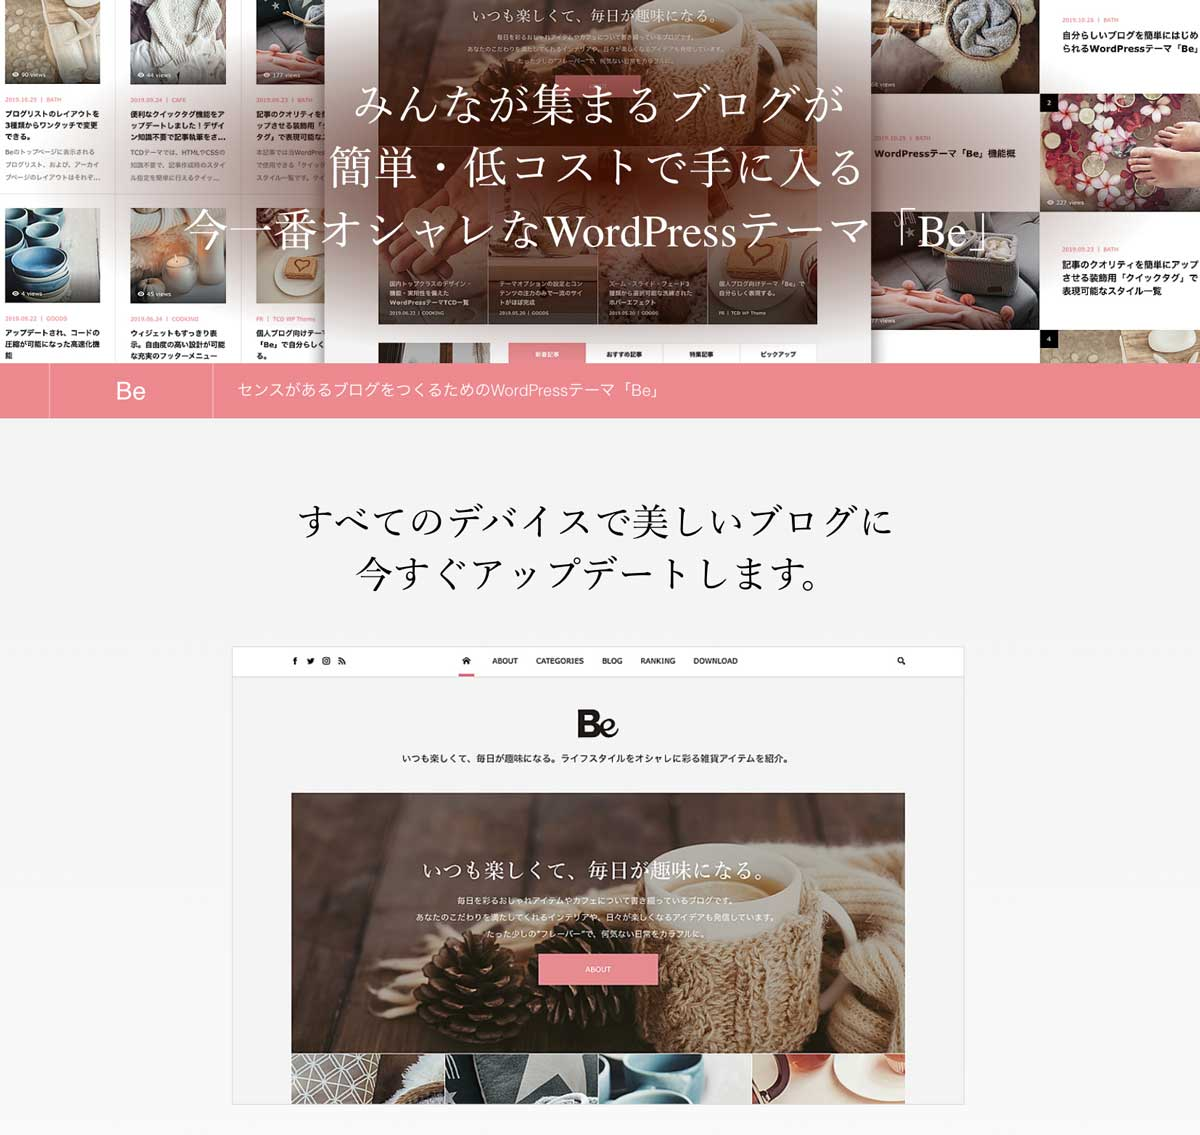 Beは、初心者でも簡単にブログサイトを立ち上げられるWordPressテーマ wordpress_free_themes_tcd076_01